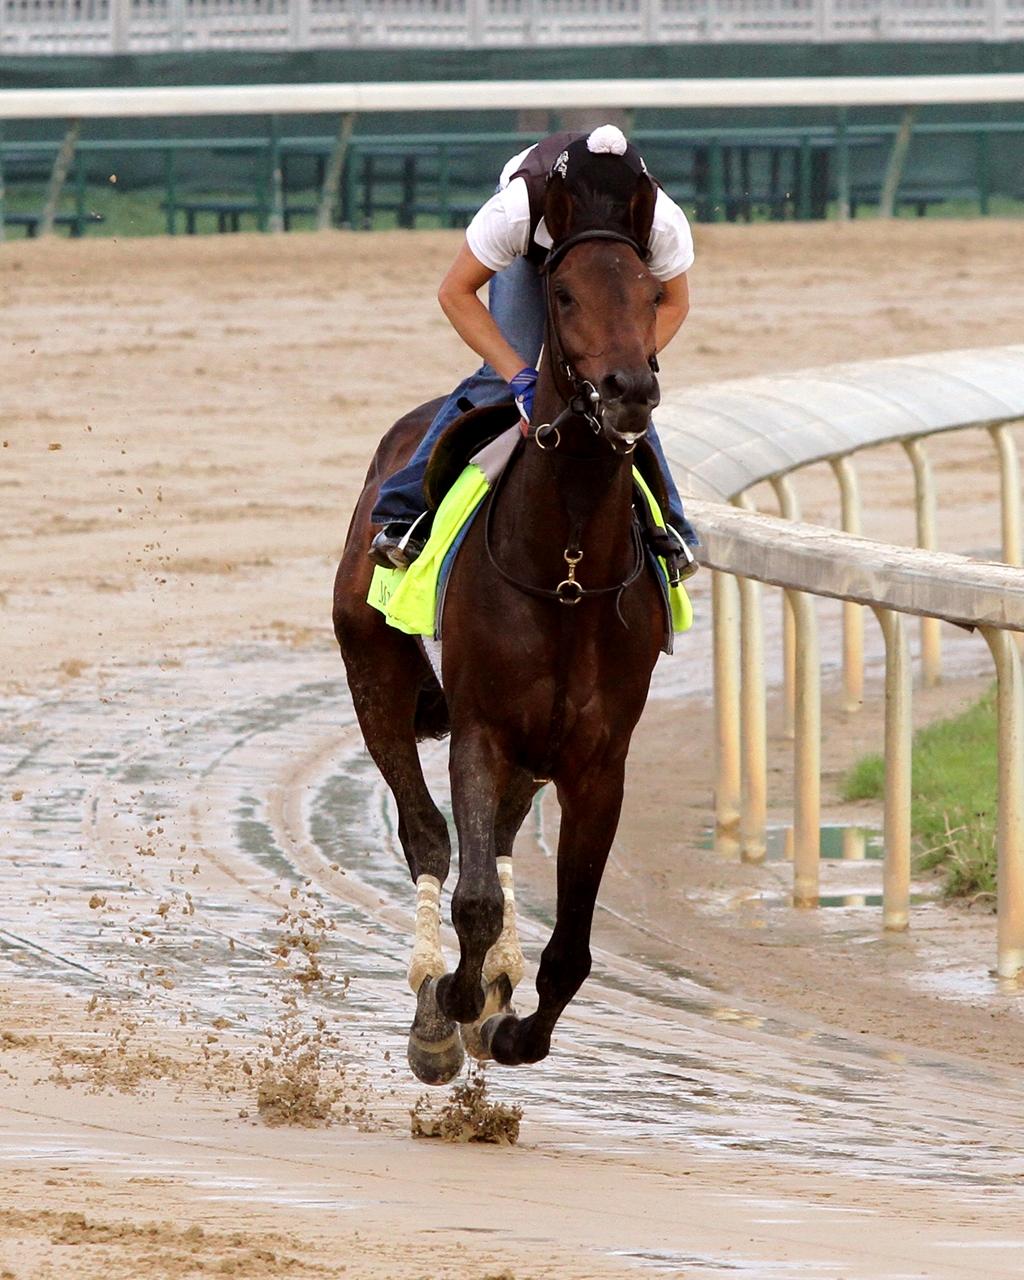 Kentucky Derby 2016: No horses scratch at deadline, the field is set